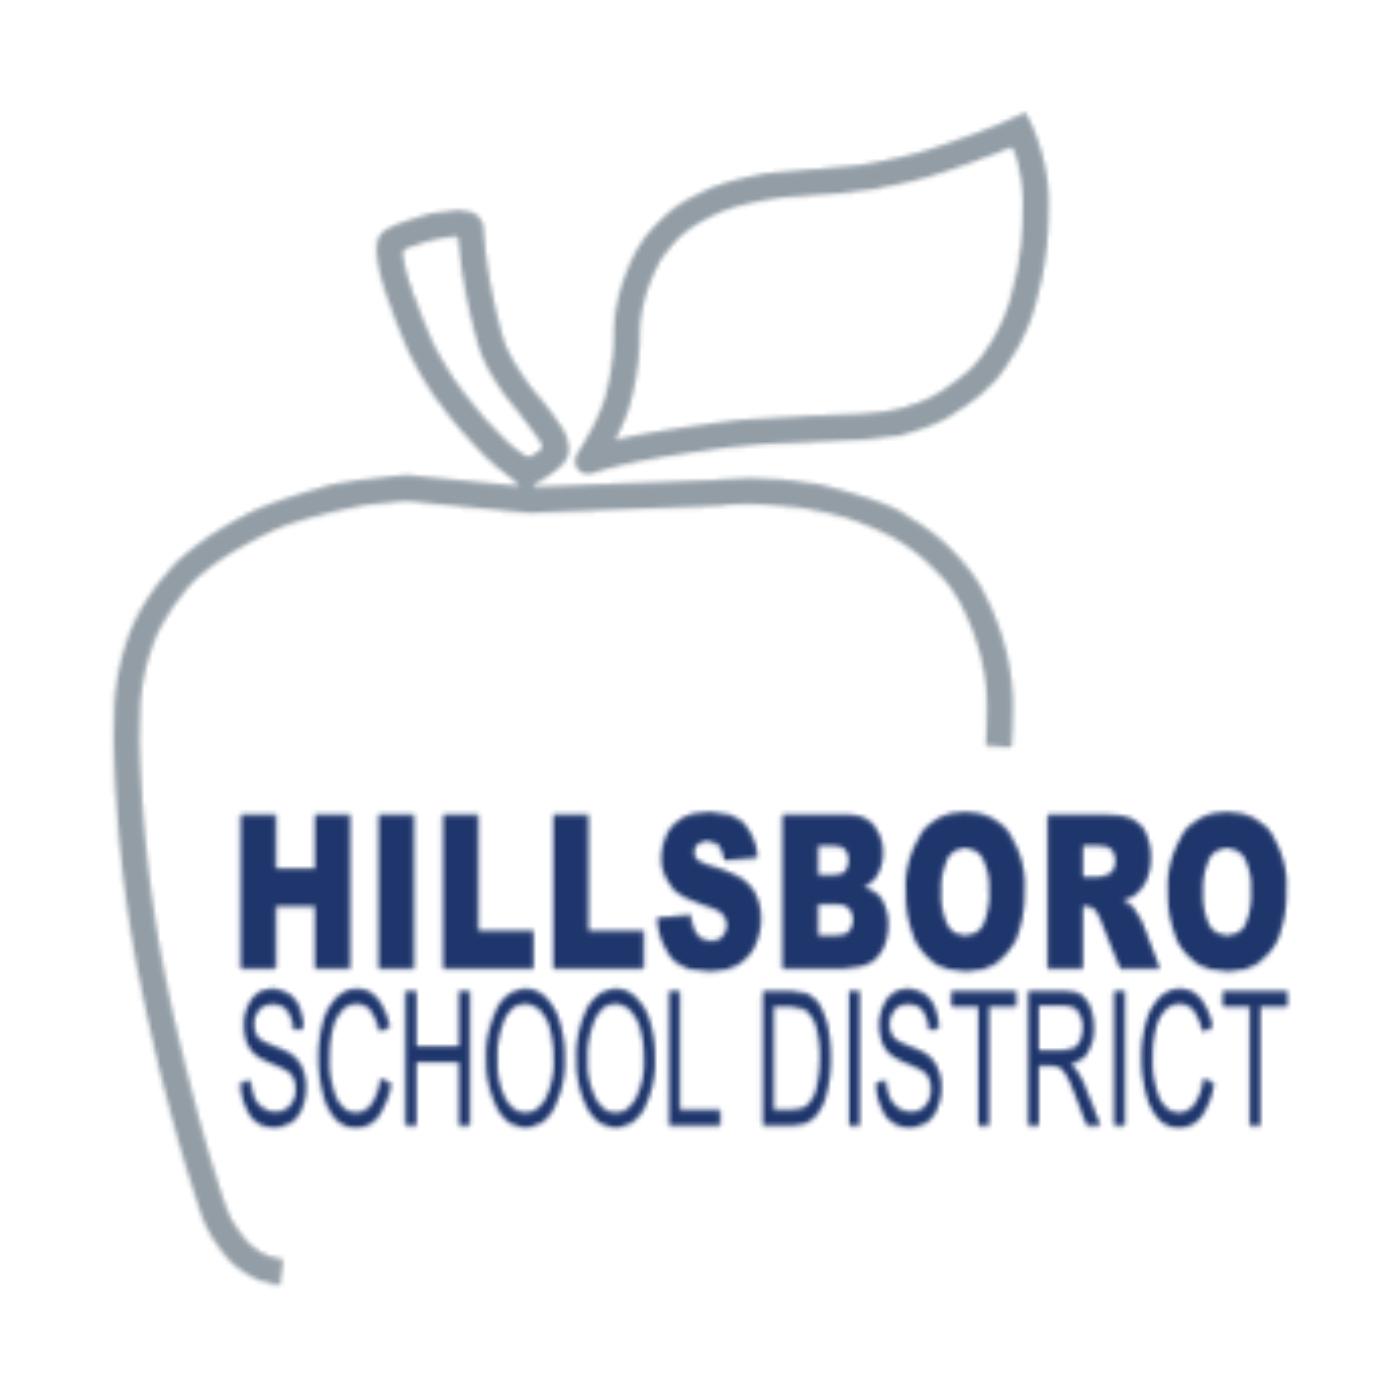 Hillsboro school district logo